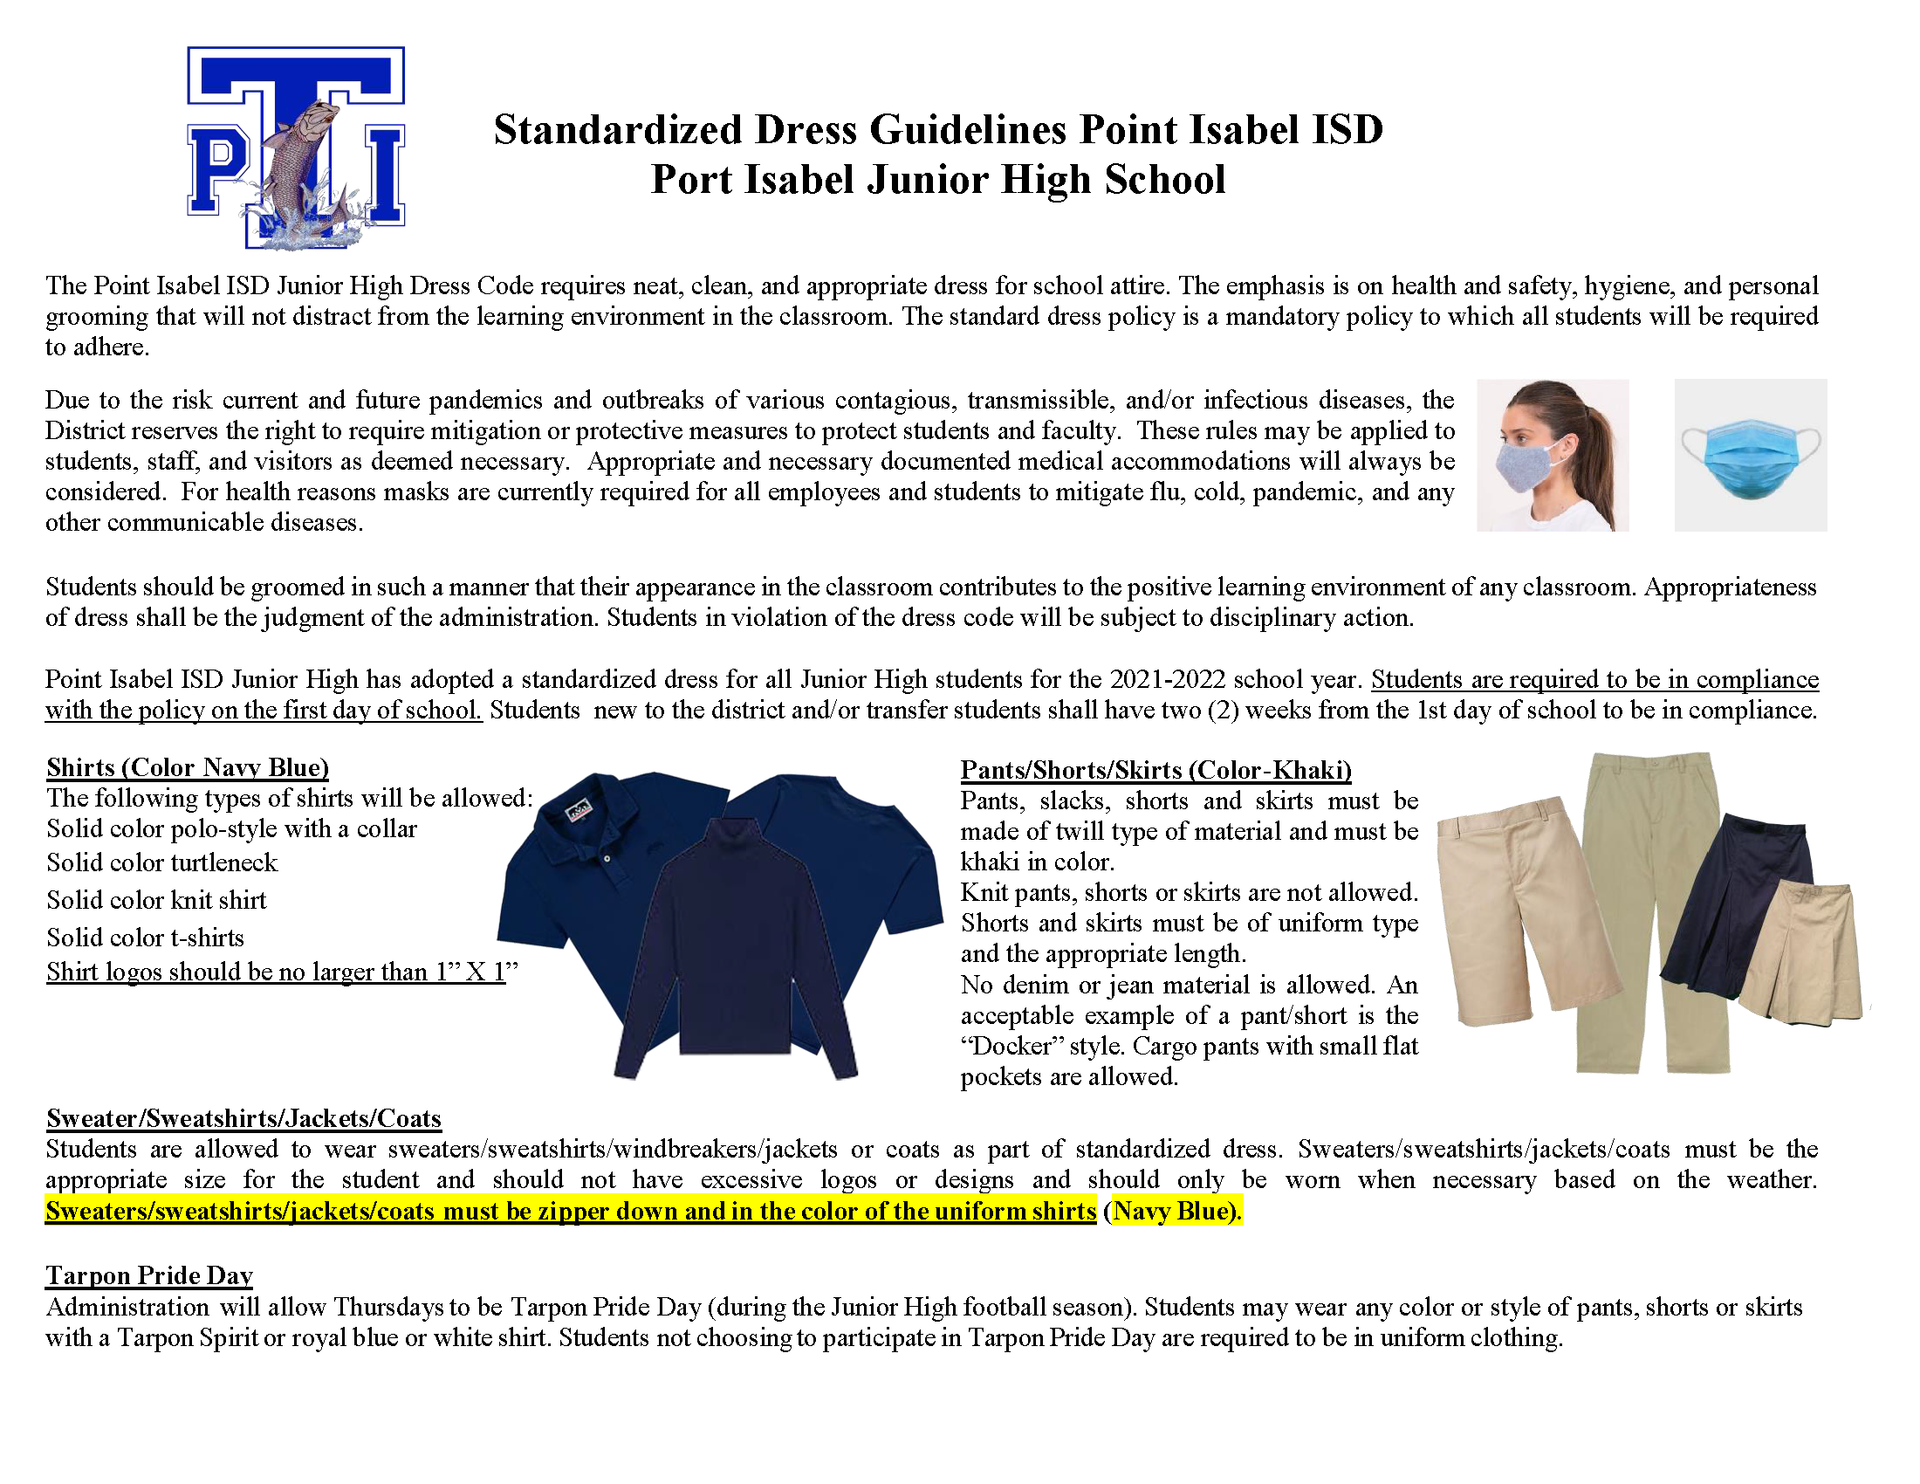 PIJH Student Dress Code